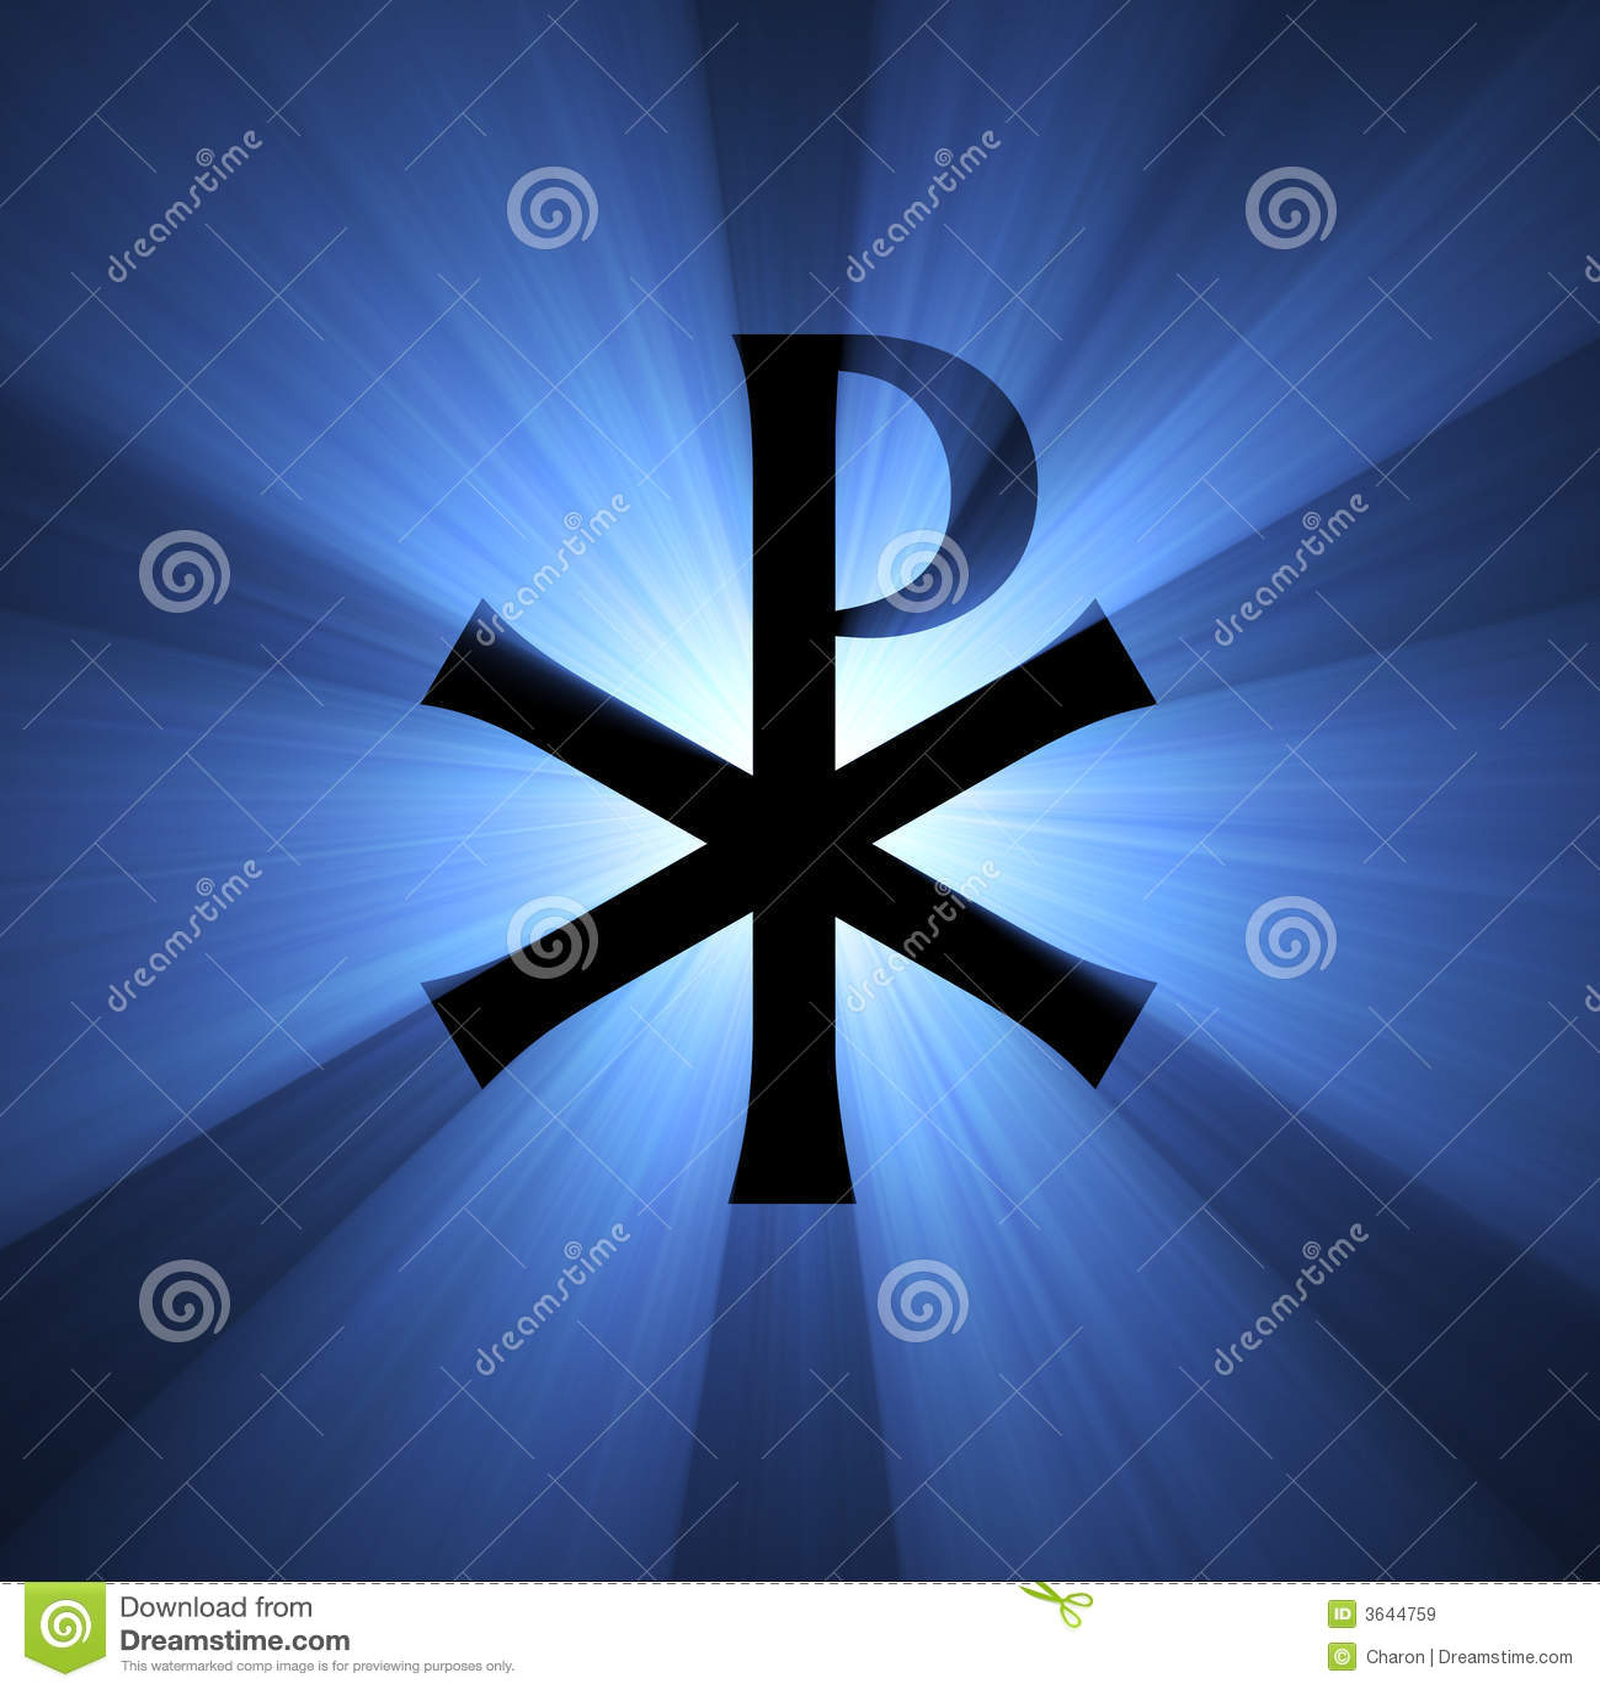 monogram of christ